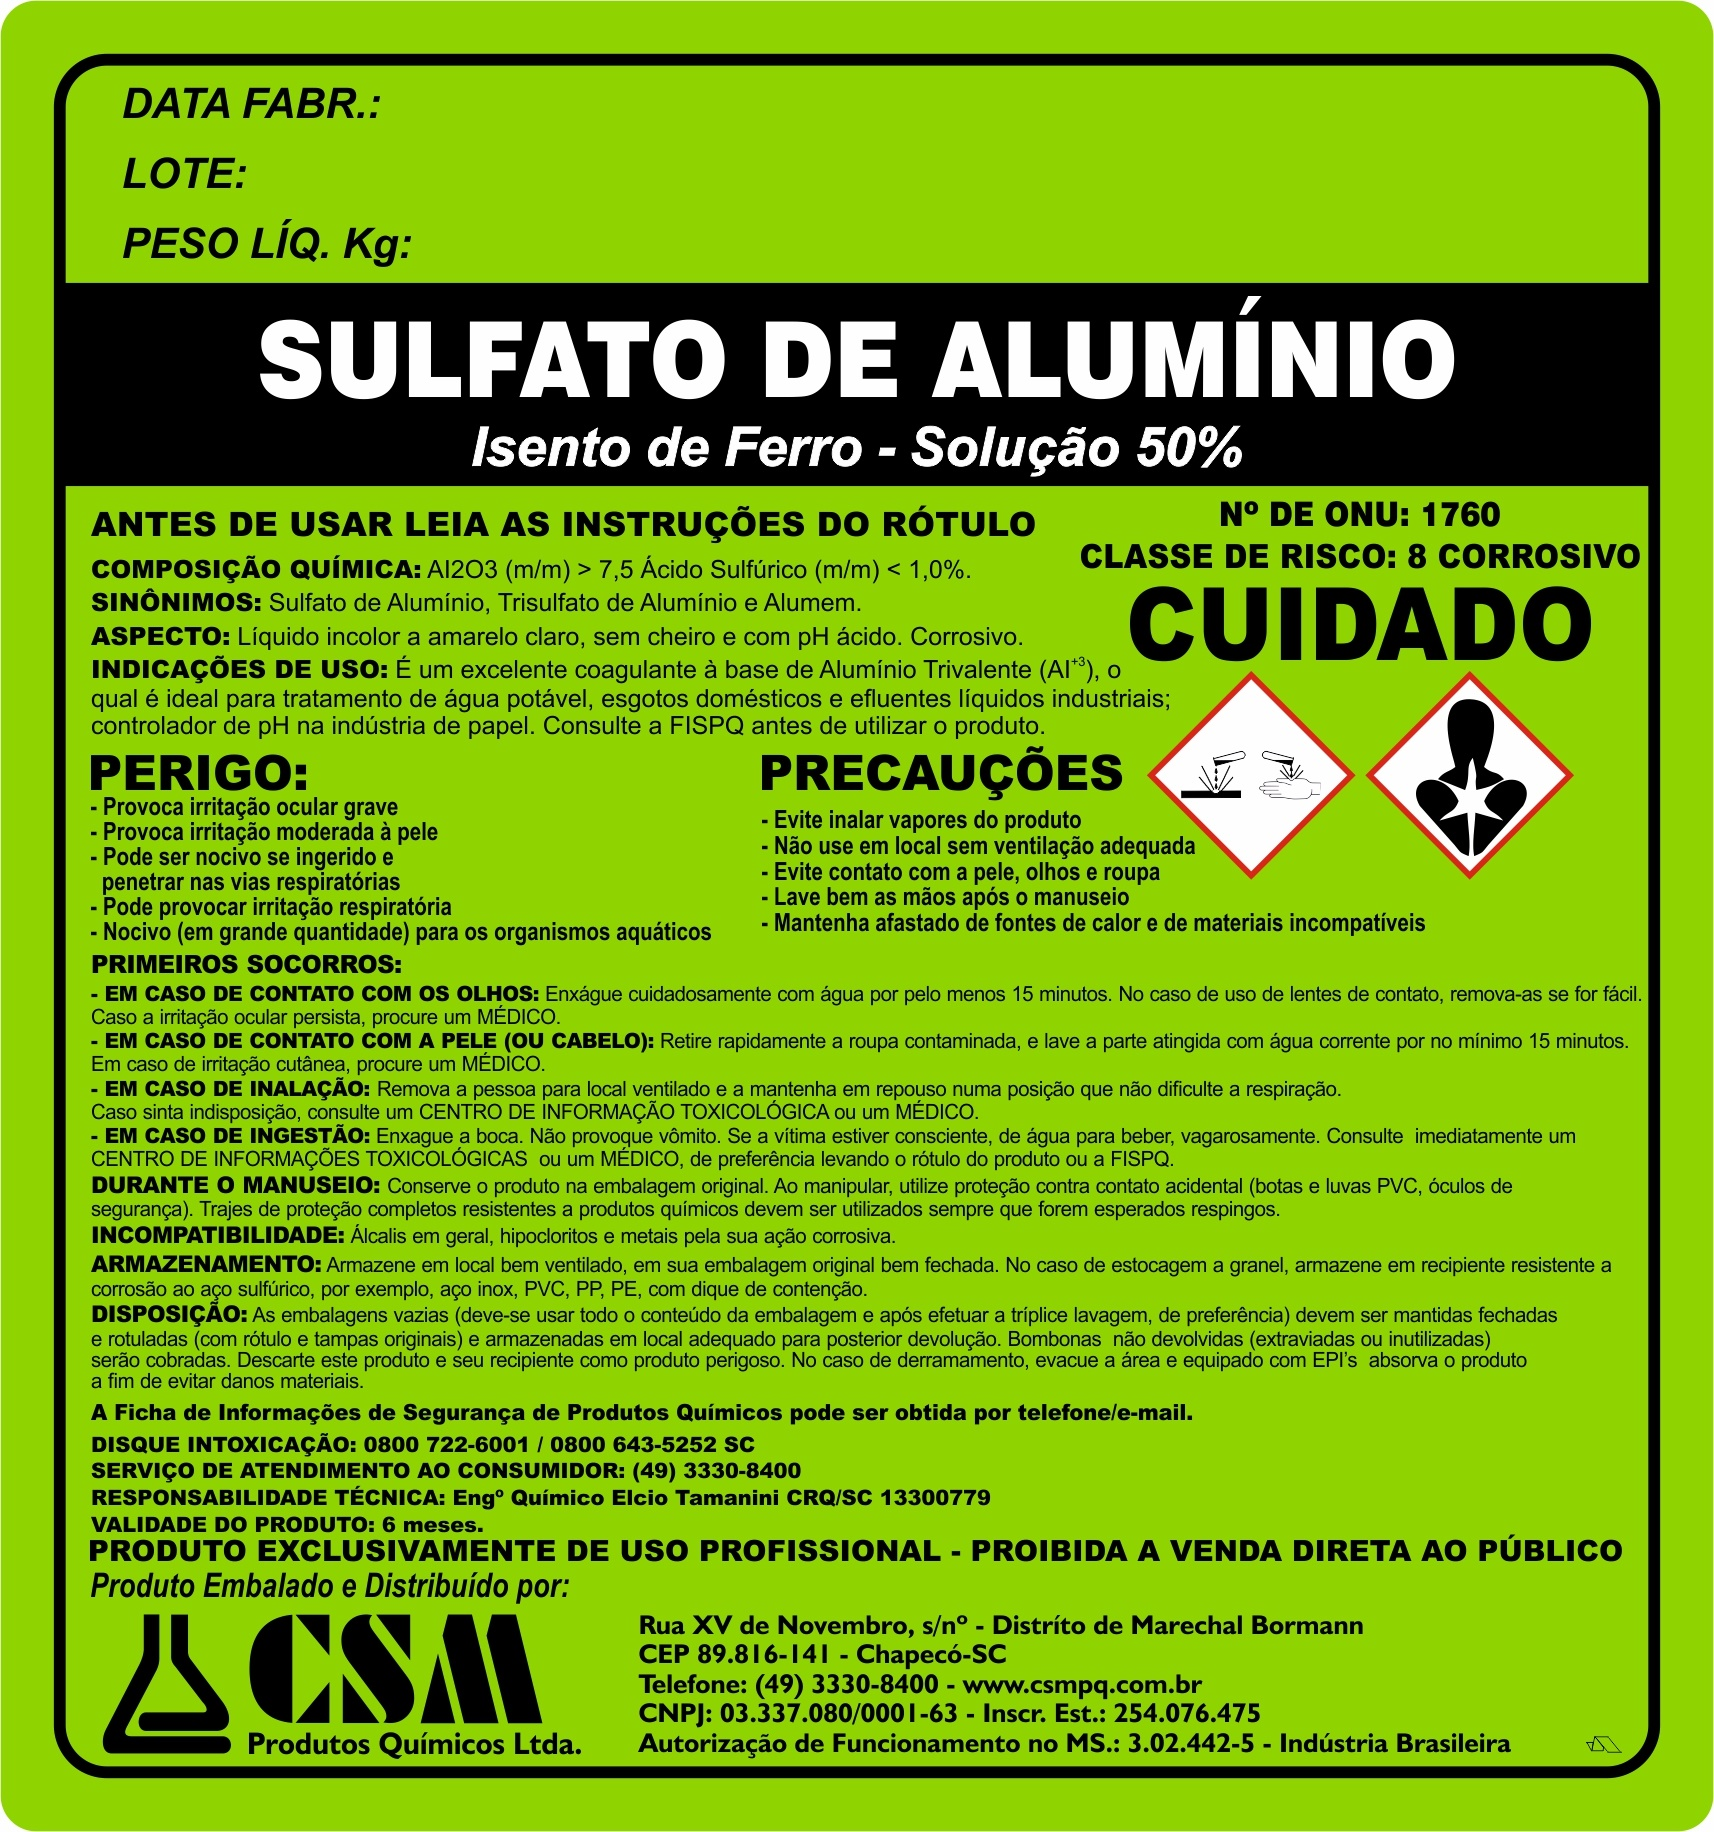 Sulfato de alumino isento de ferro